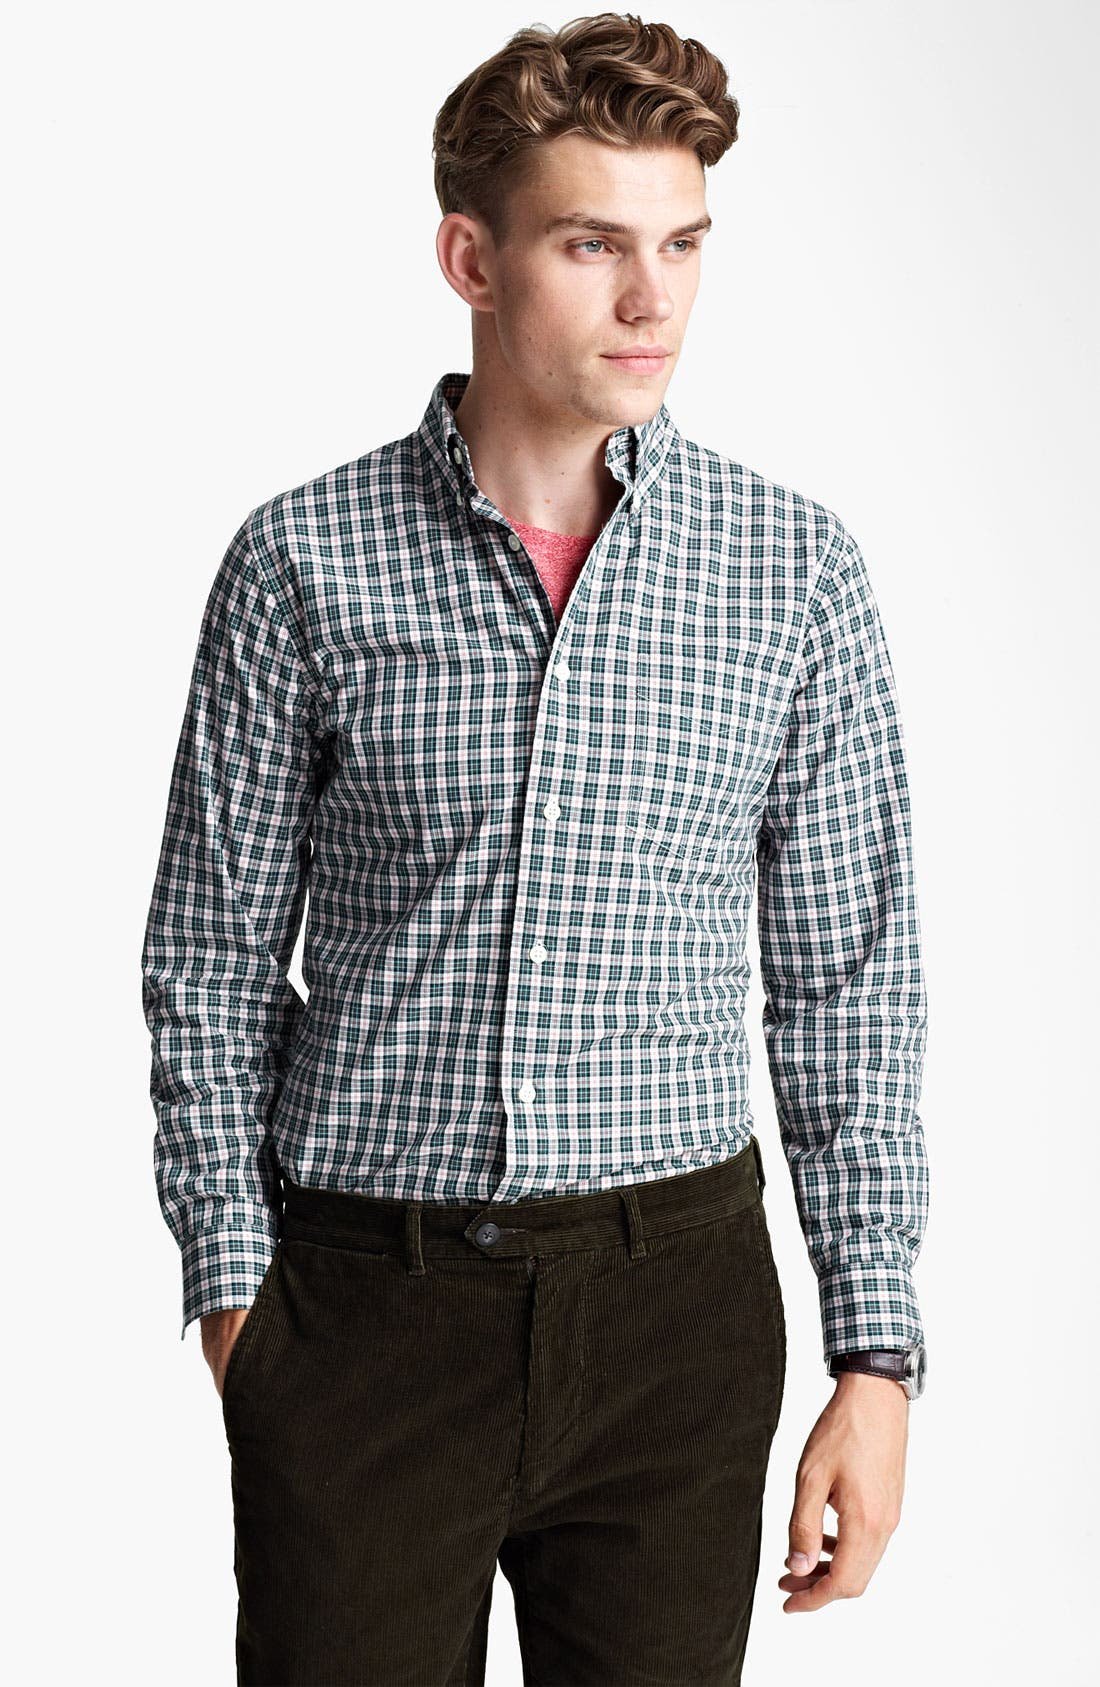 Alternate Image 1 Selected - Jack Spade 'Snyder' Check Woven Shirt